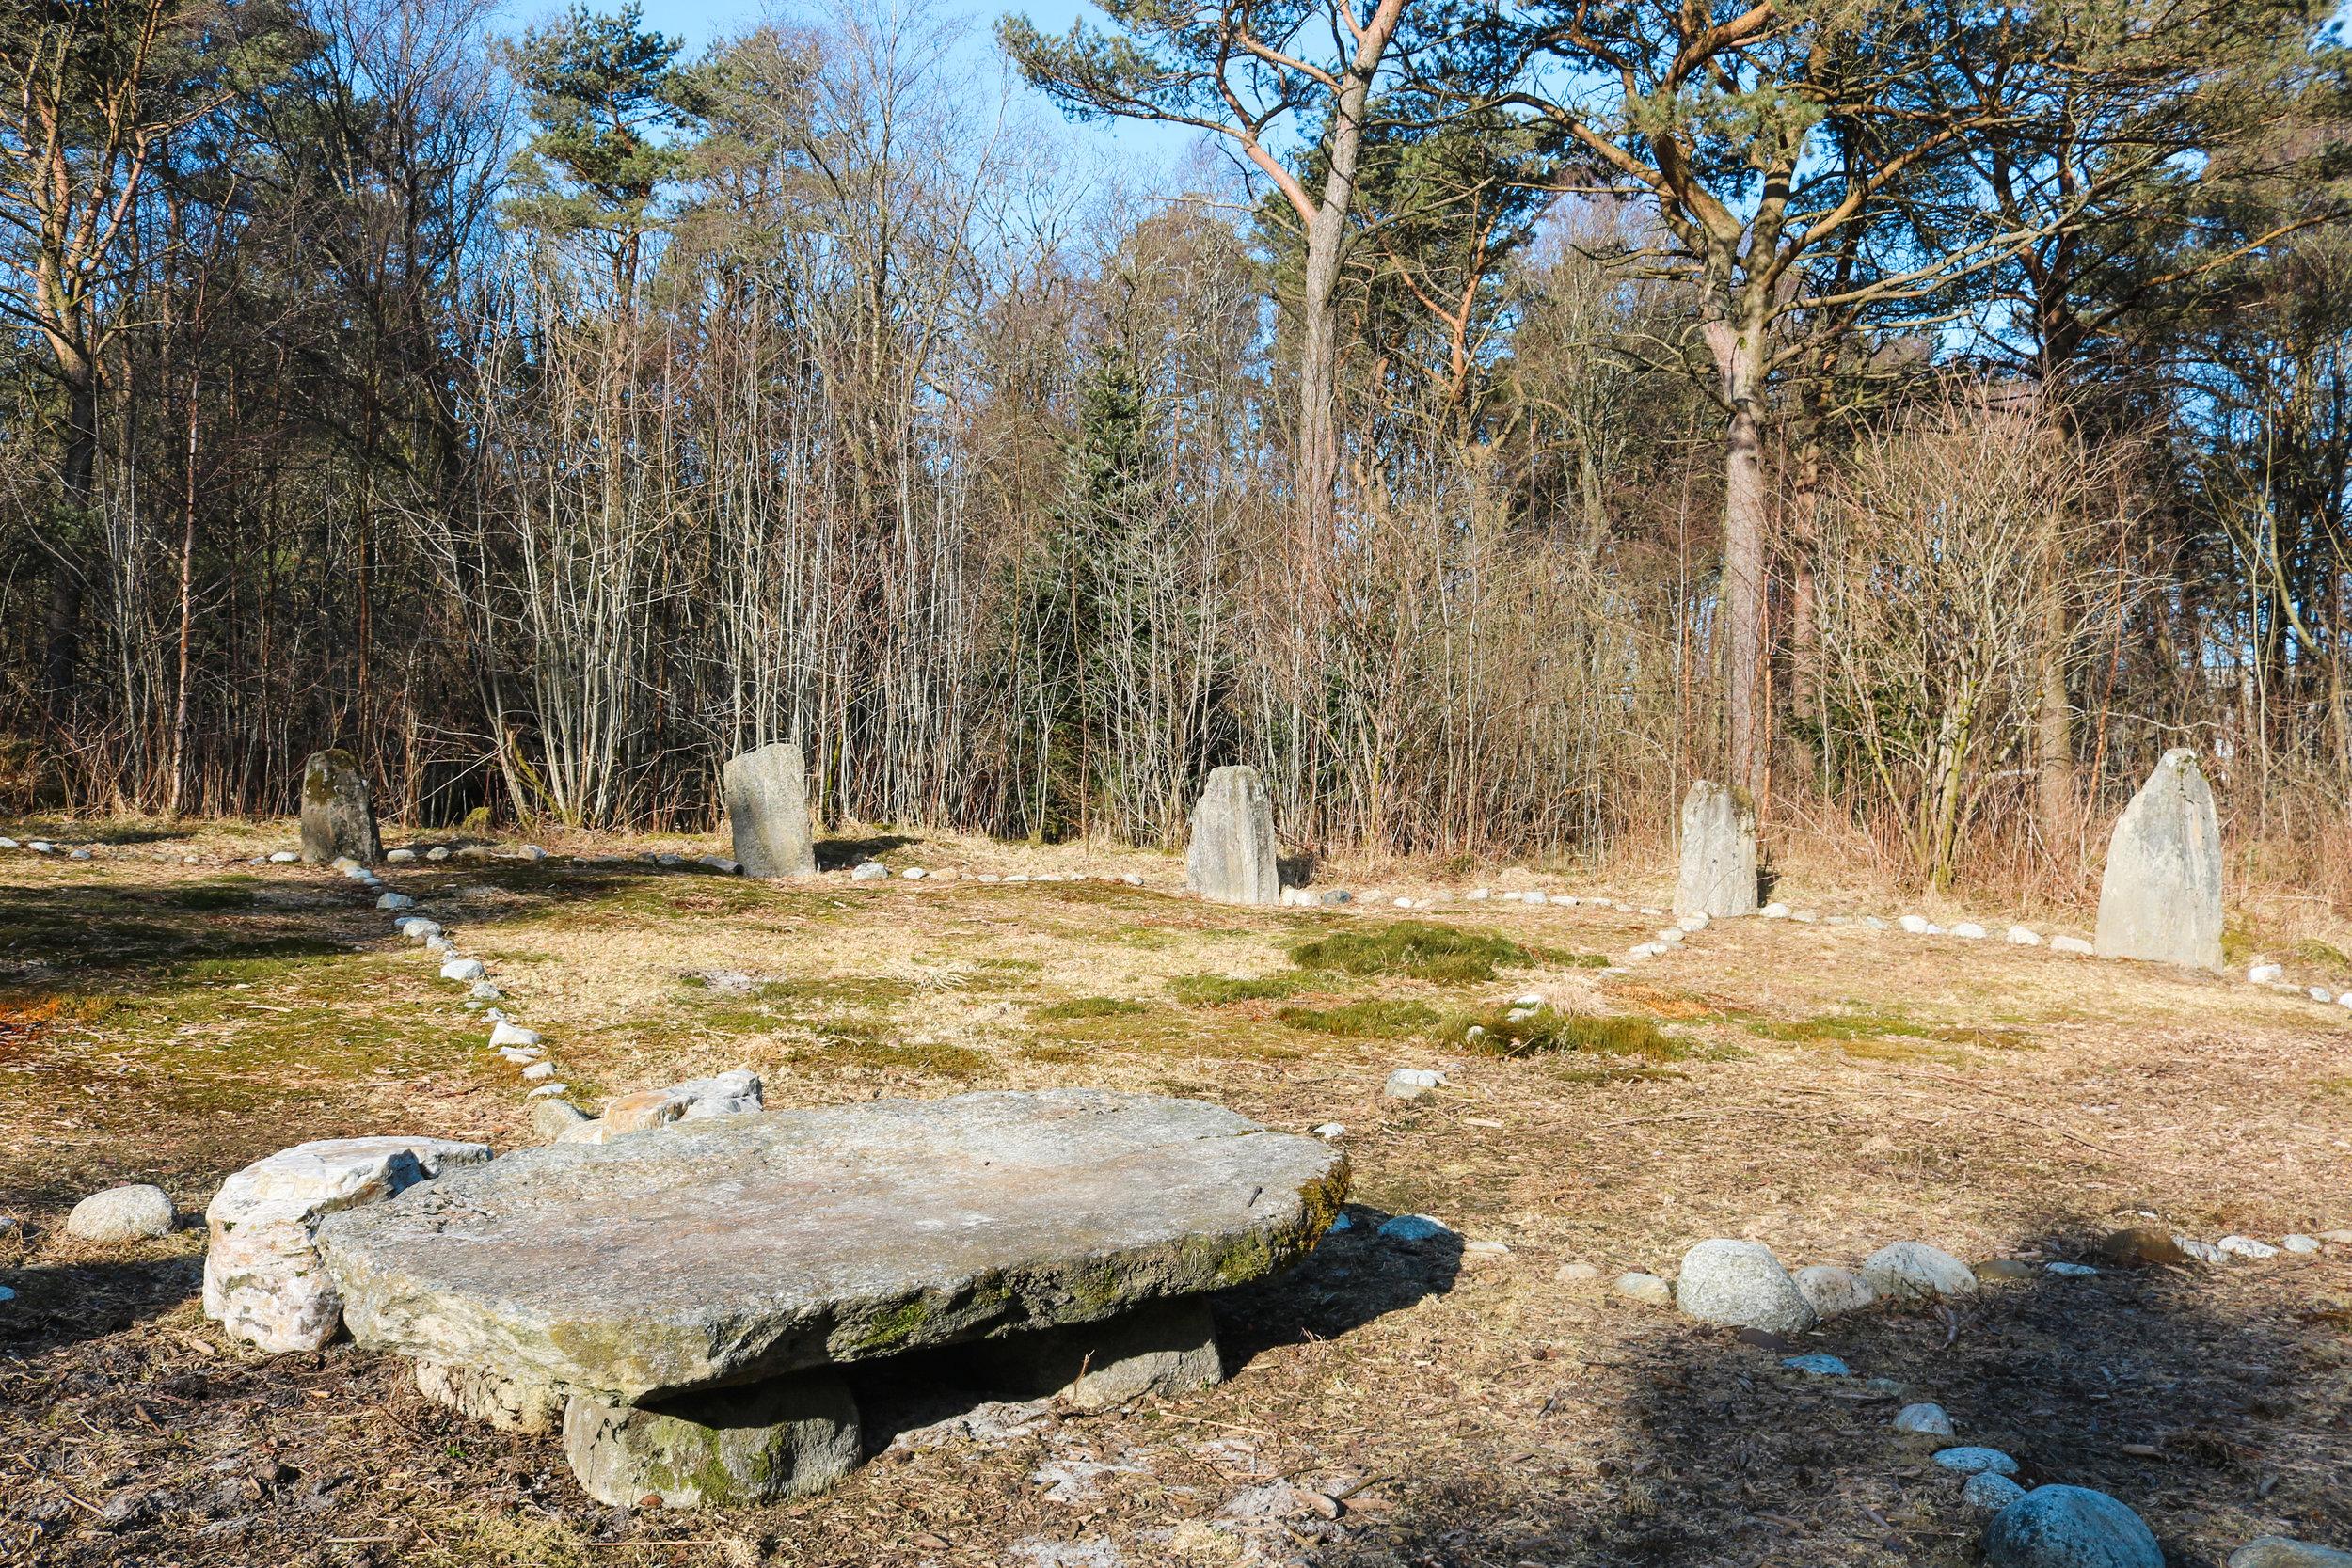 domsteinane stone circle sola stavanger norway